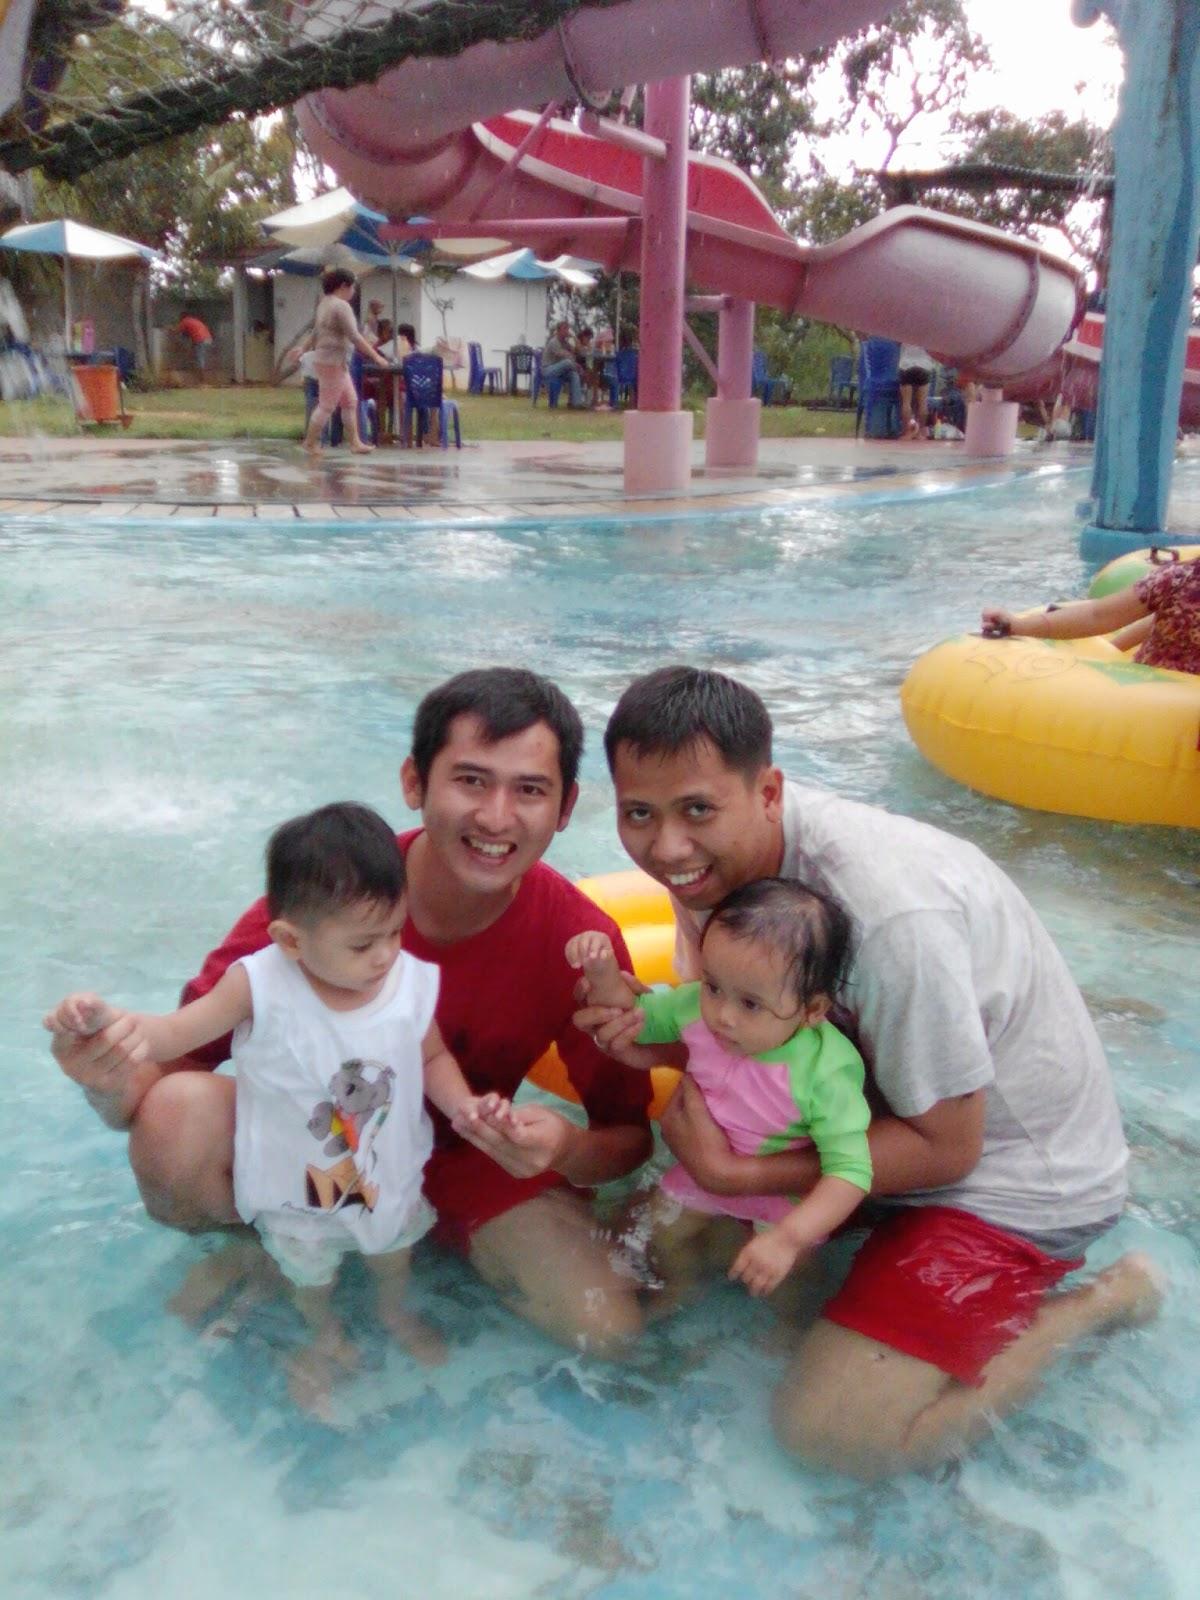 Water Park Citra Garden : water, citra, garden, Ferdiansyah:, Water, Citra, Garden, Lampung